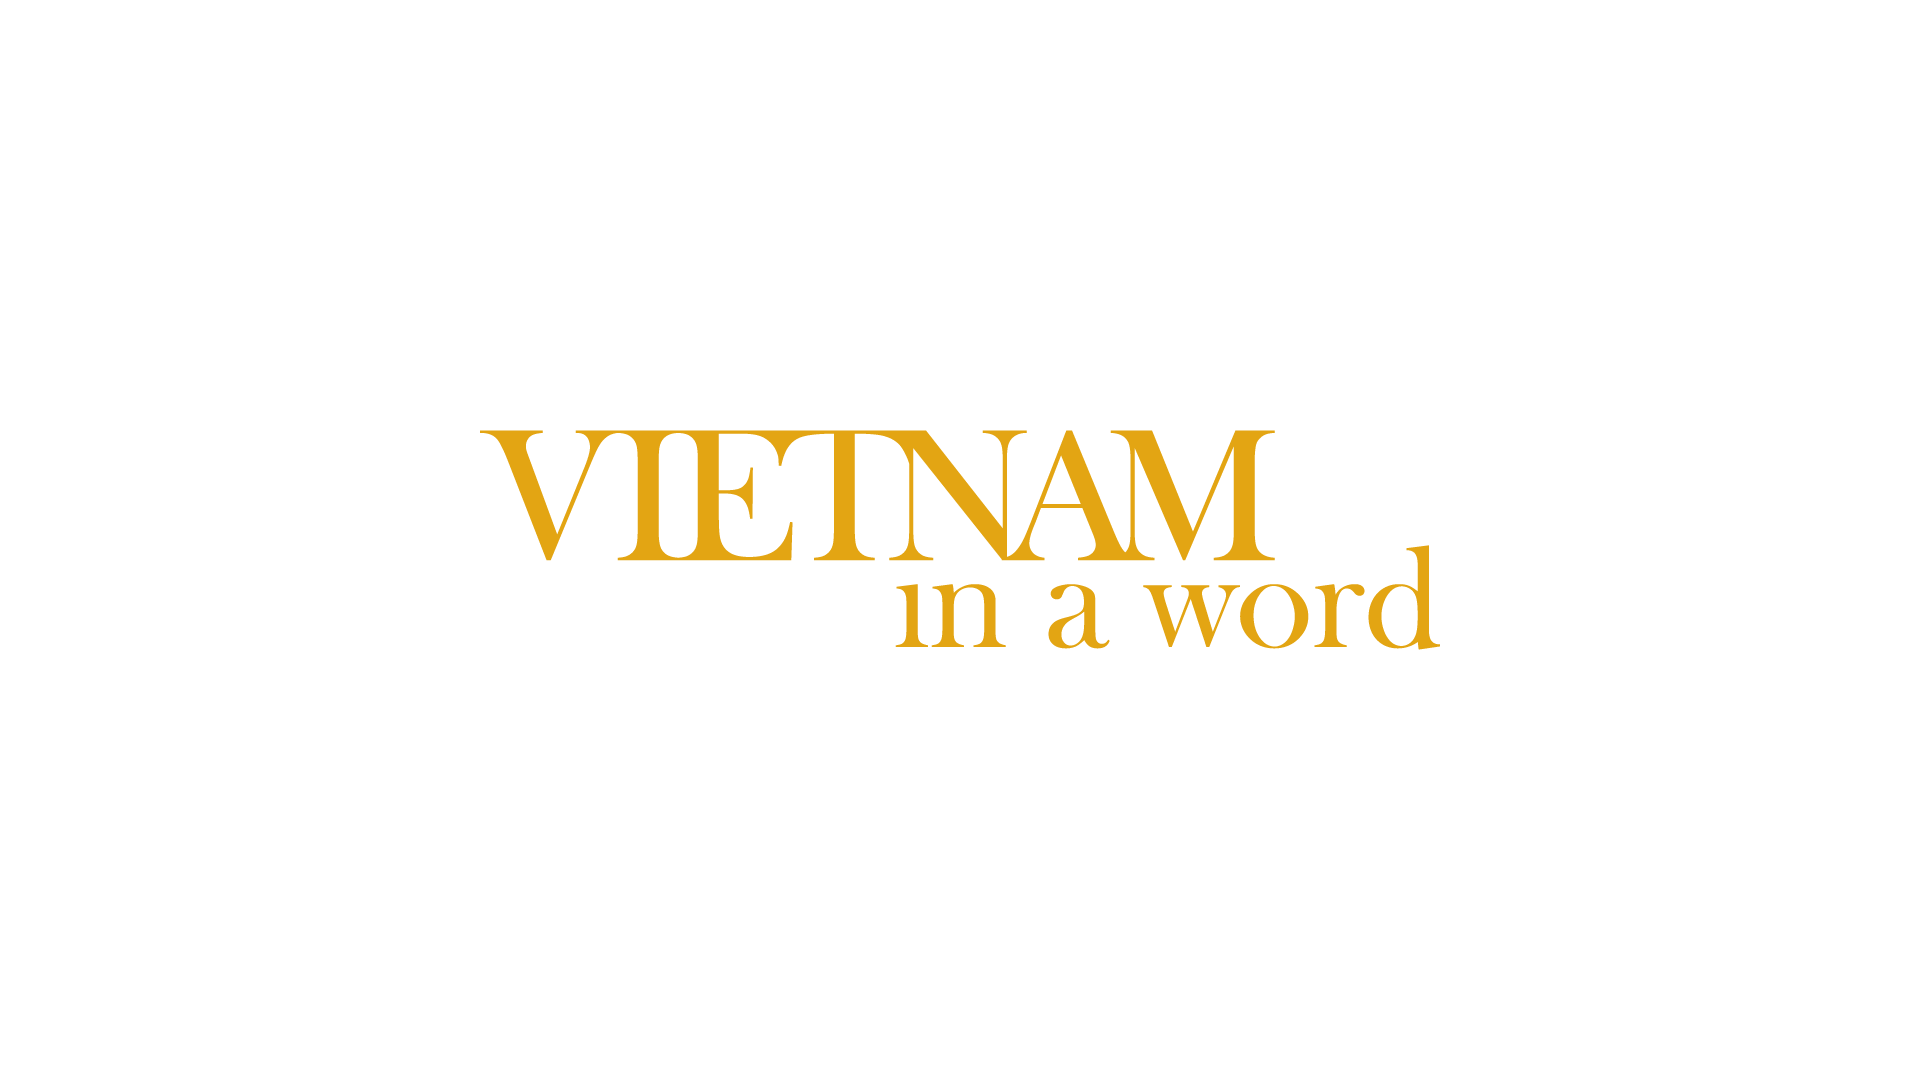 Vietnam in a Word logo in gold, serif type.